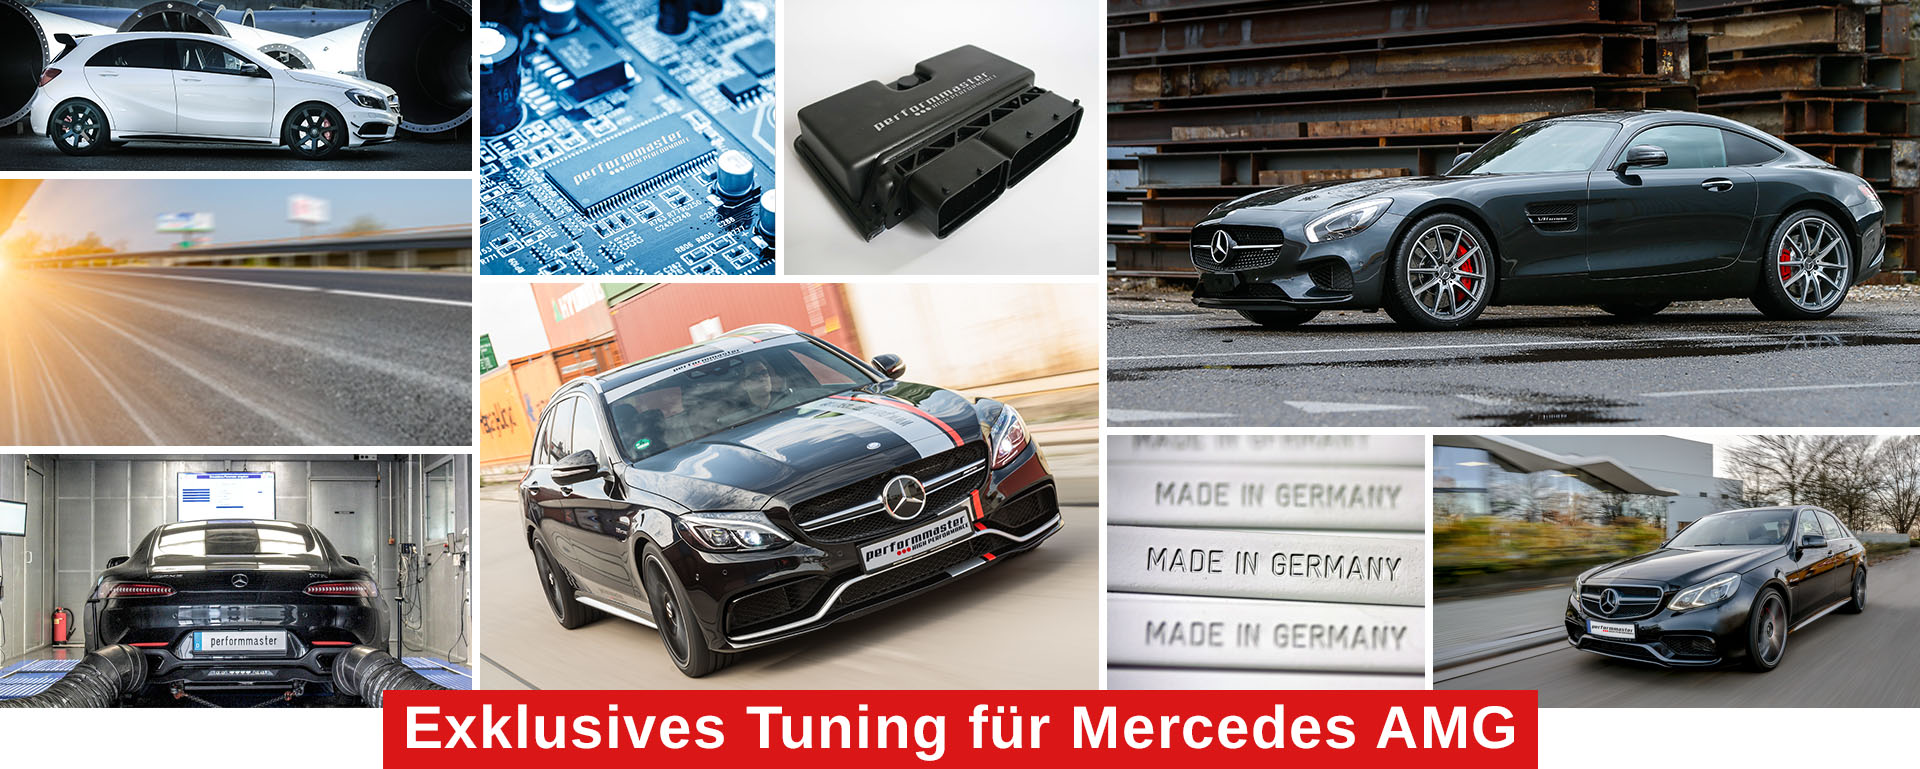 Mercedes AMG Tuning